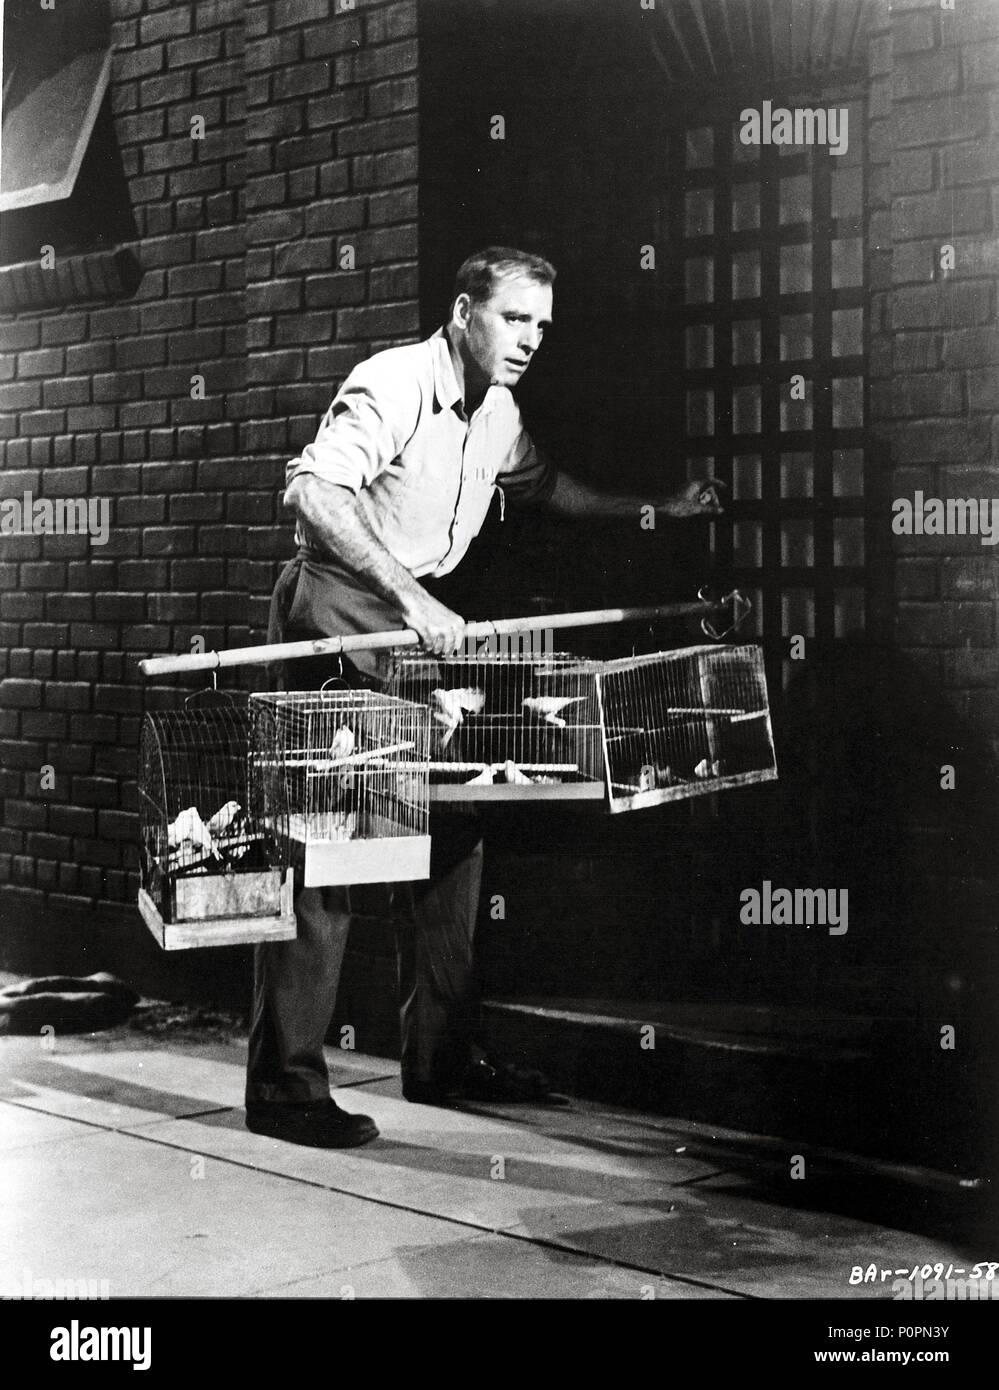 Original Film Title: BIRDMAN OF ALCATRAZ.  English Title: BIRDMAN OF ALCATRAZ.  Film Director: JOHN FRANKENHEIMER.  Year: 1962.  Stars: BURT LANCASTER. Credit: UNITED ARTISTS / Album Stock Photo